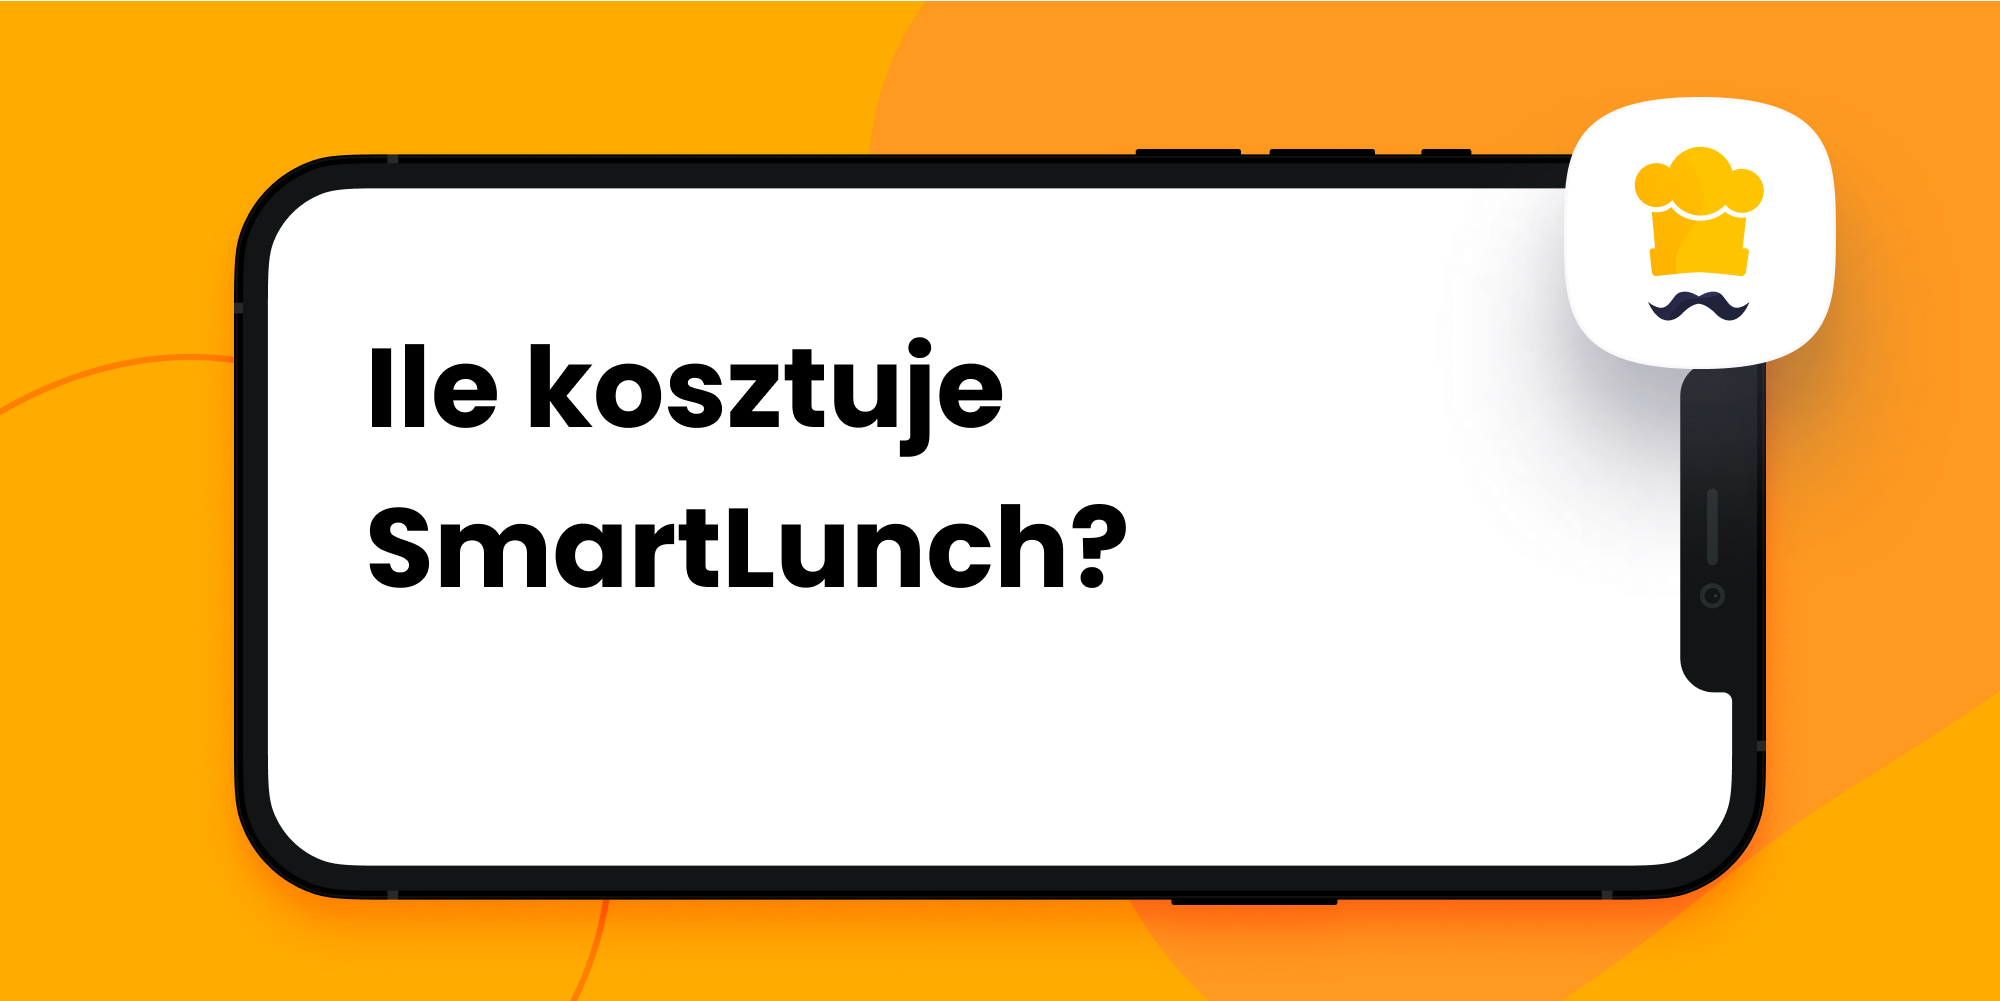 Ile kosztuje SmartLunch?